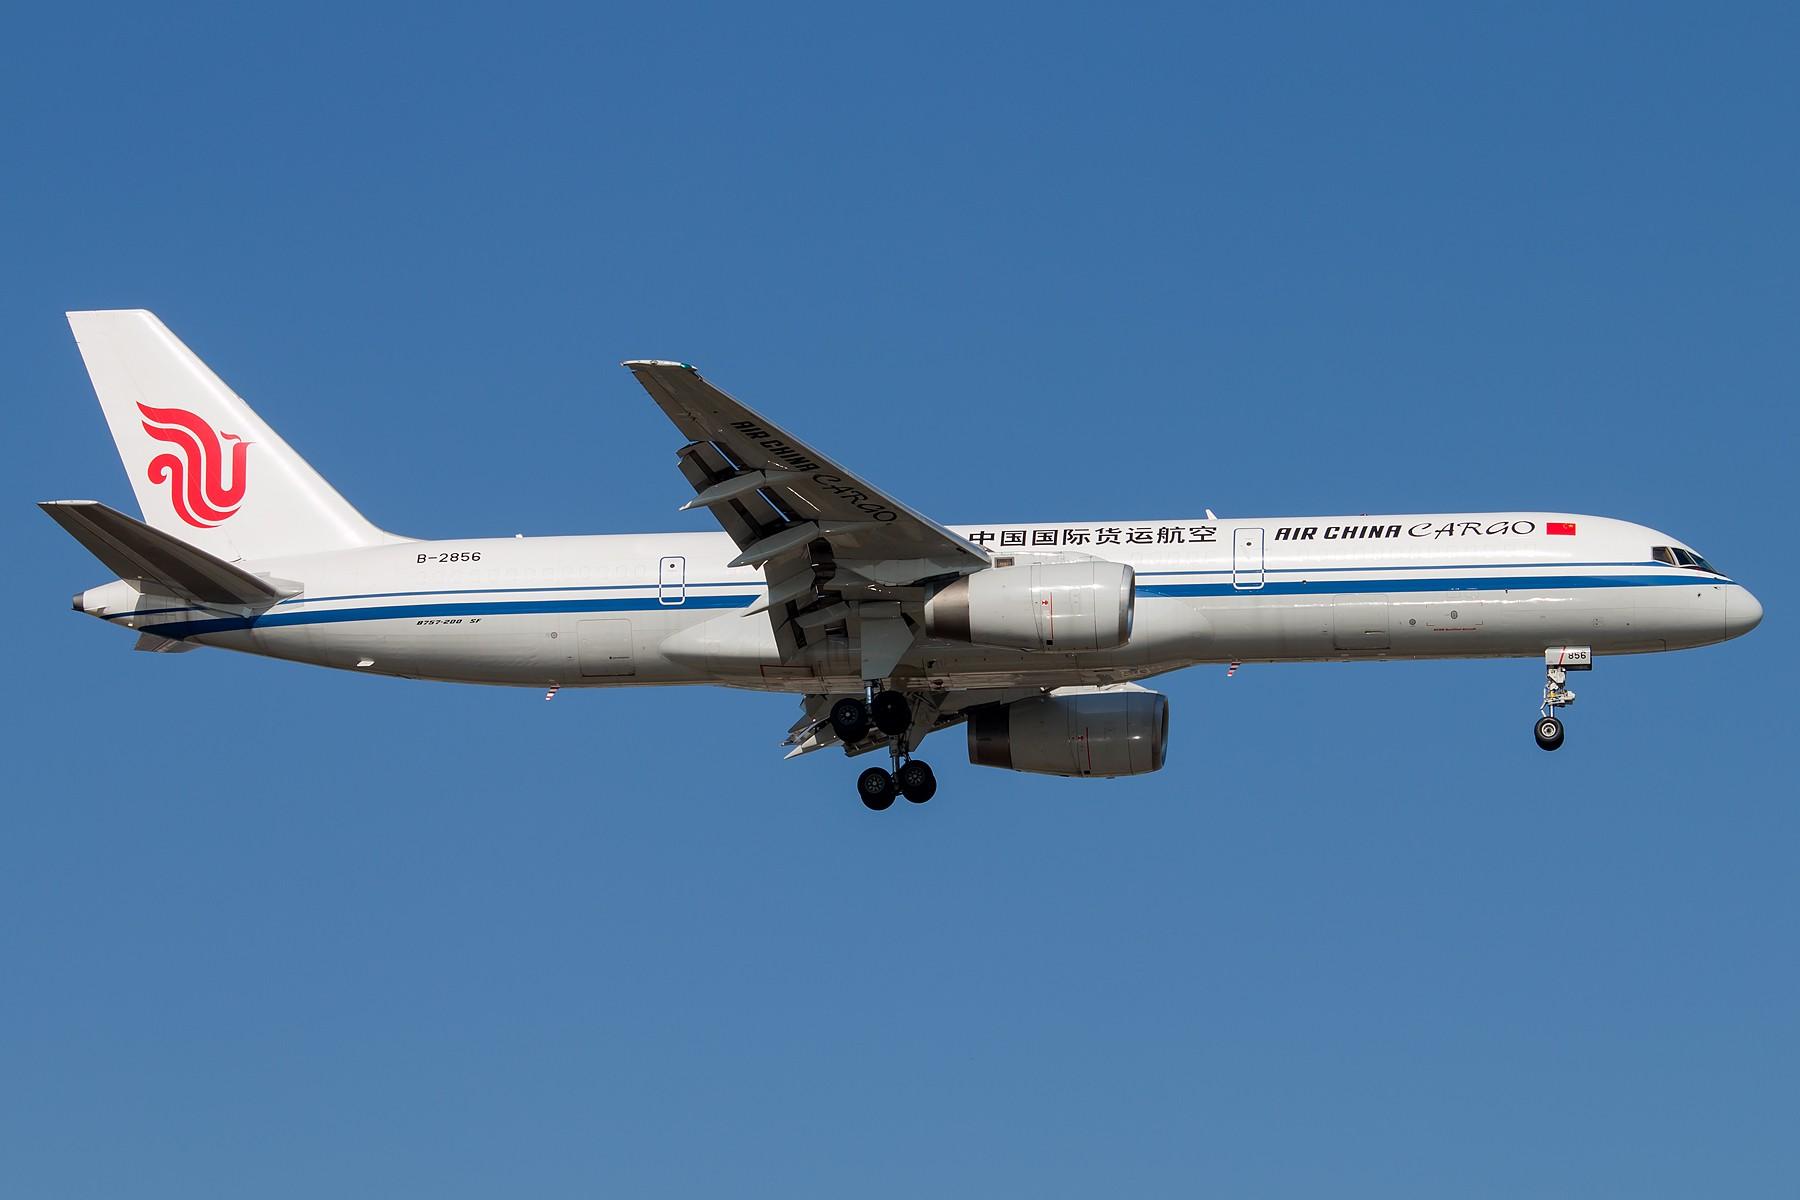 Re:[原创]亮亮哒 1800*1200 [5pics] BOEING 757-200F B-2856 中国北京首都国际机场